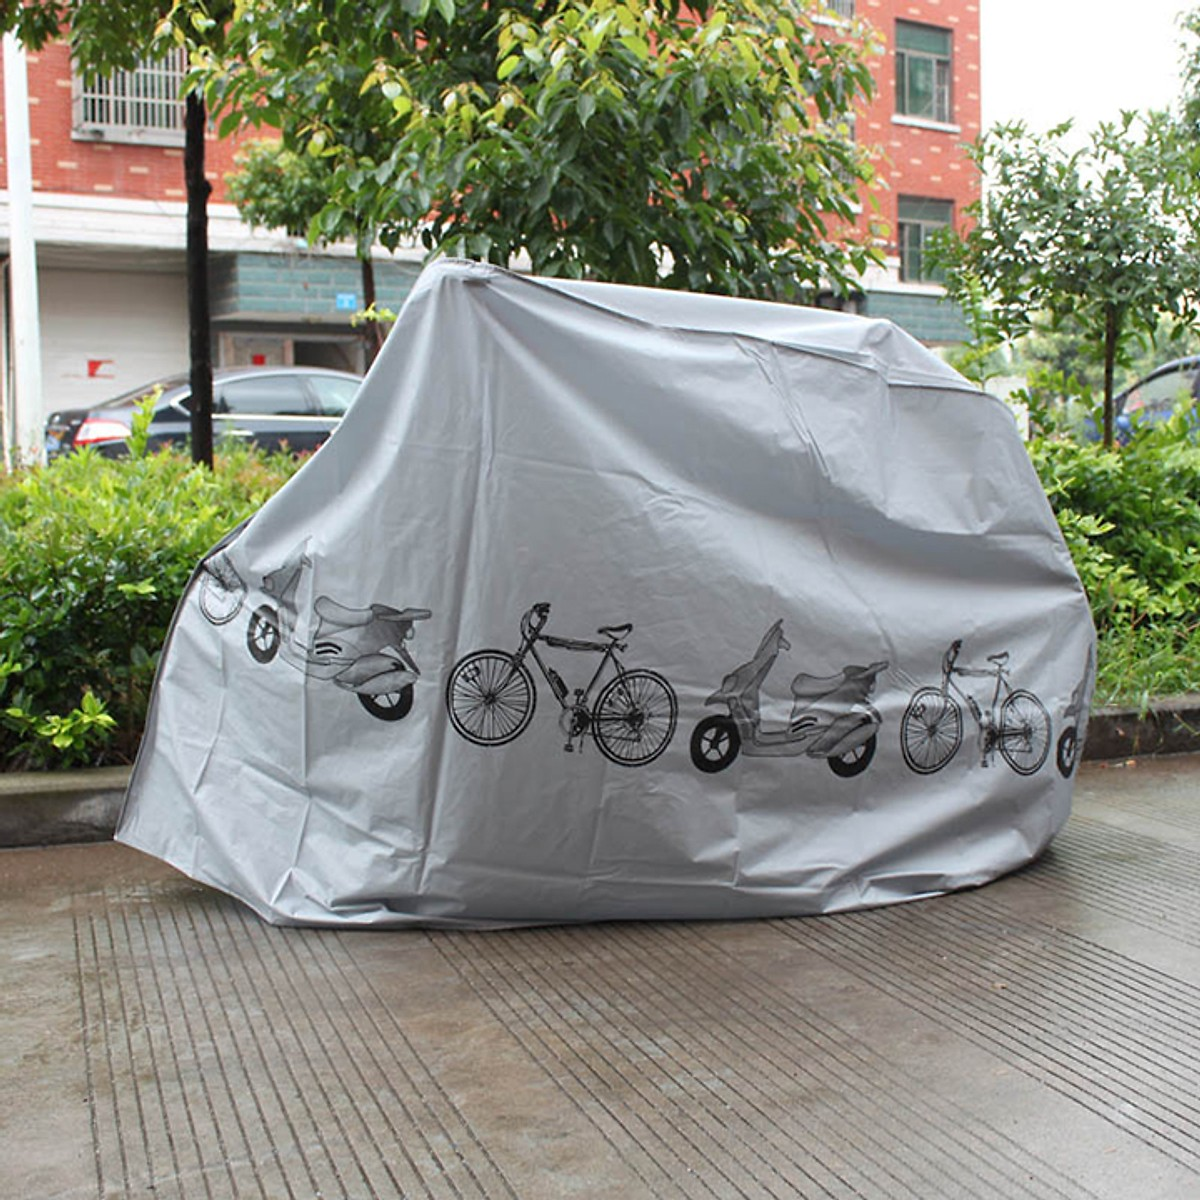 Tấm bạt phủ xe máy=41.975 ₫